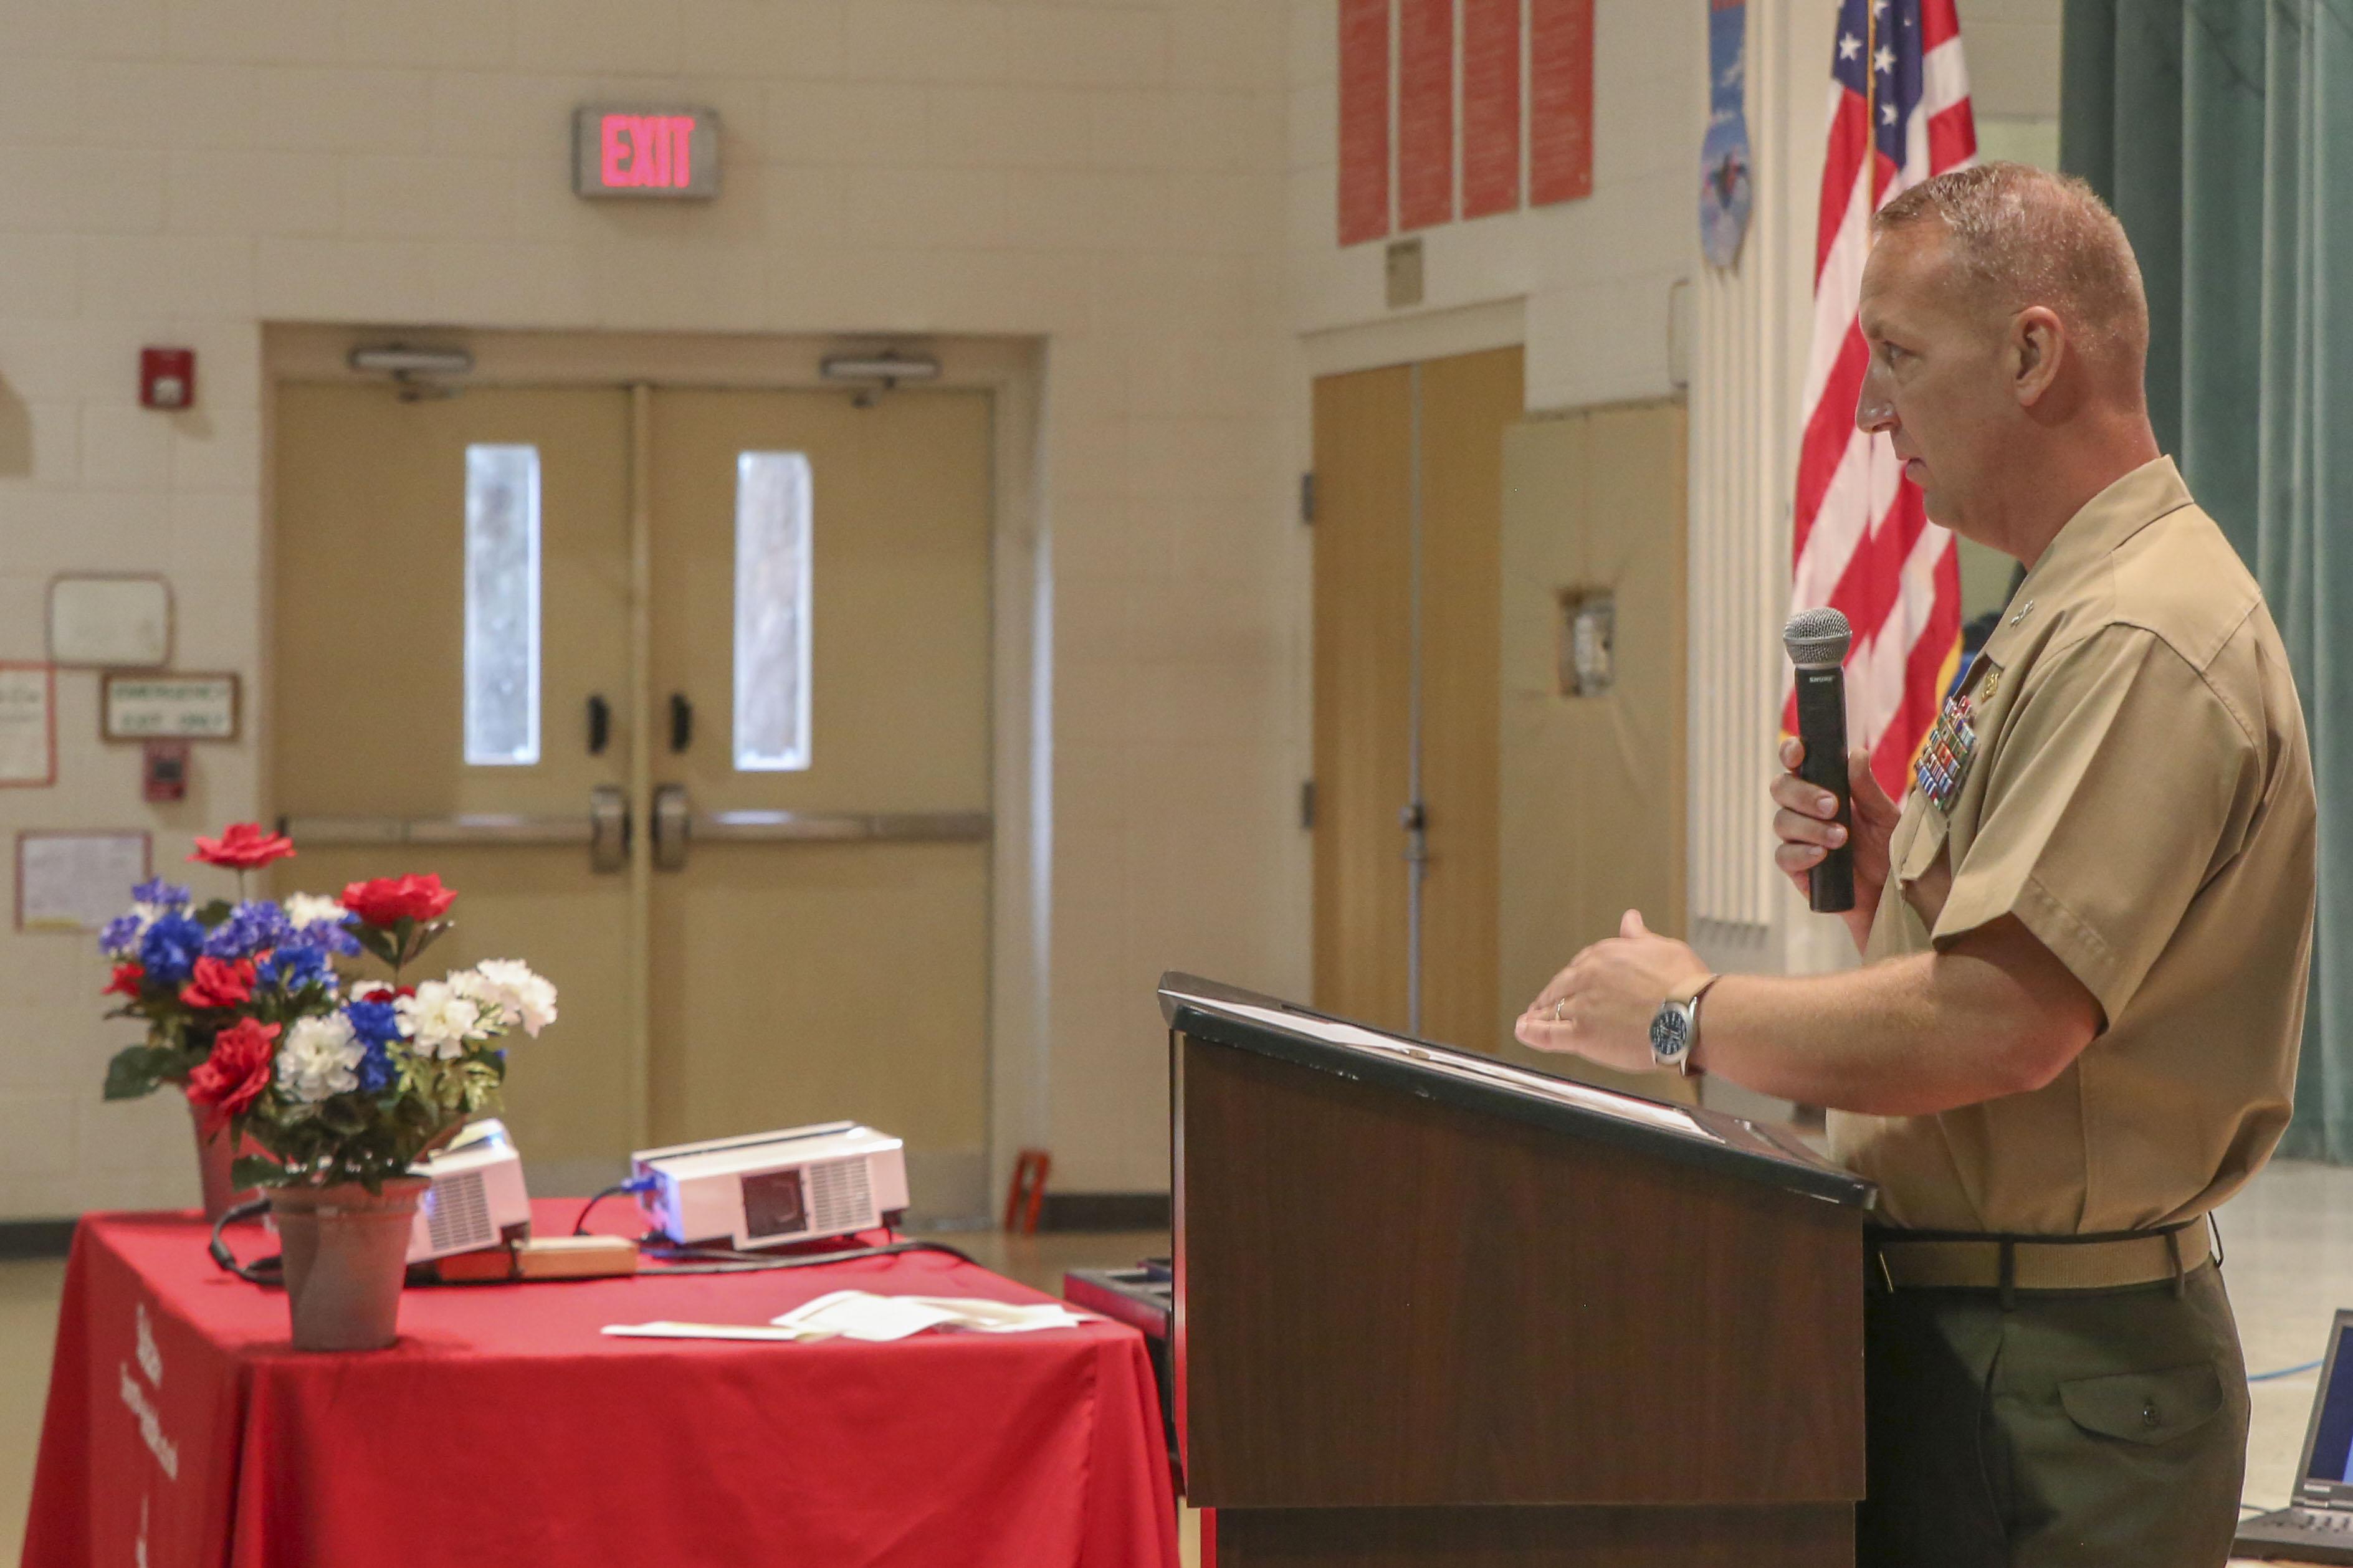 Laurel Bay schools welcome back staff, faculty